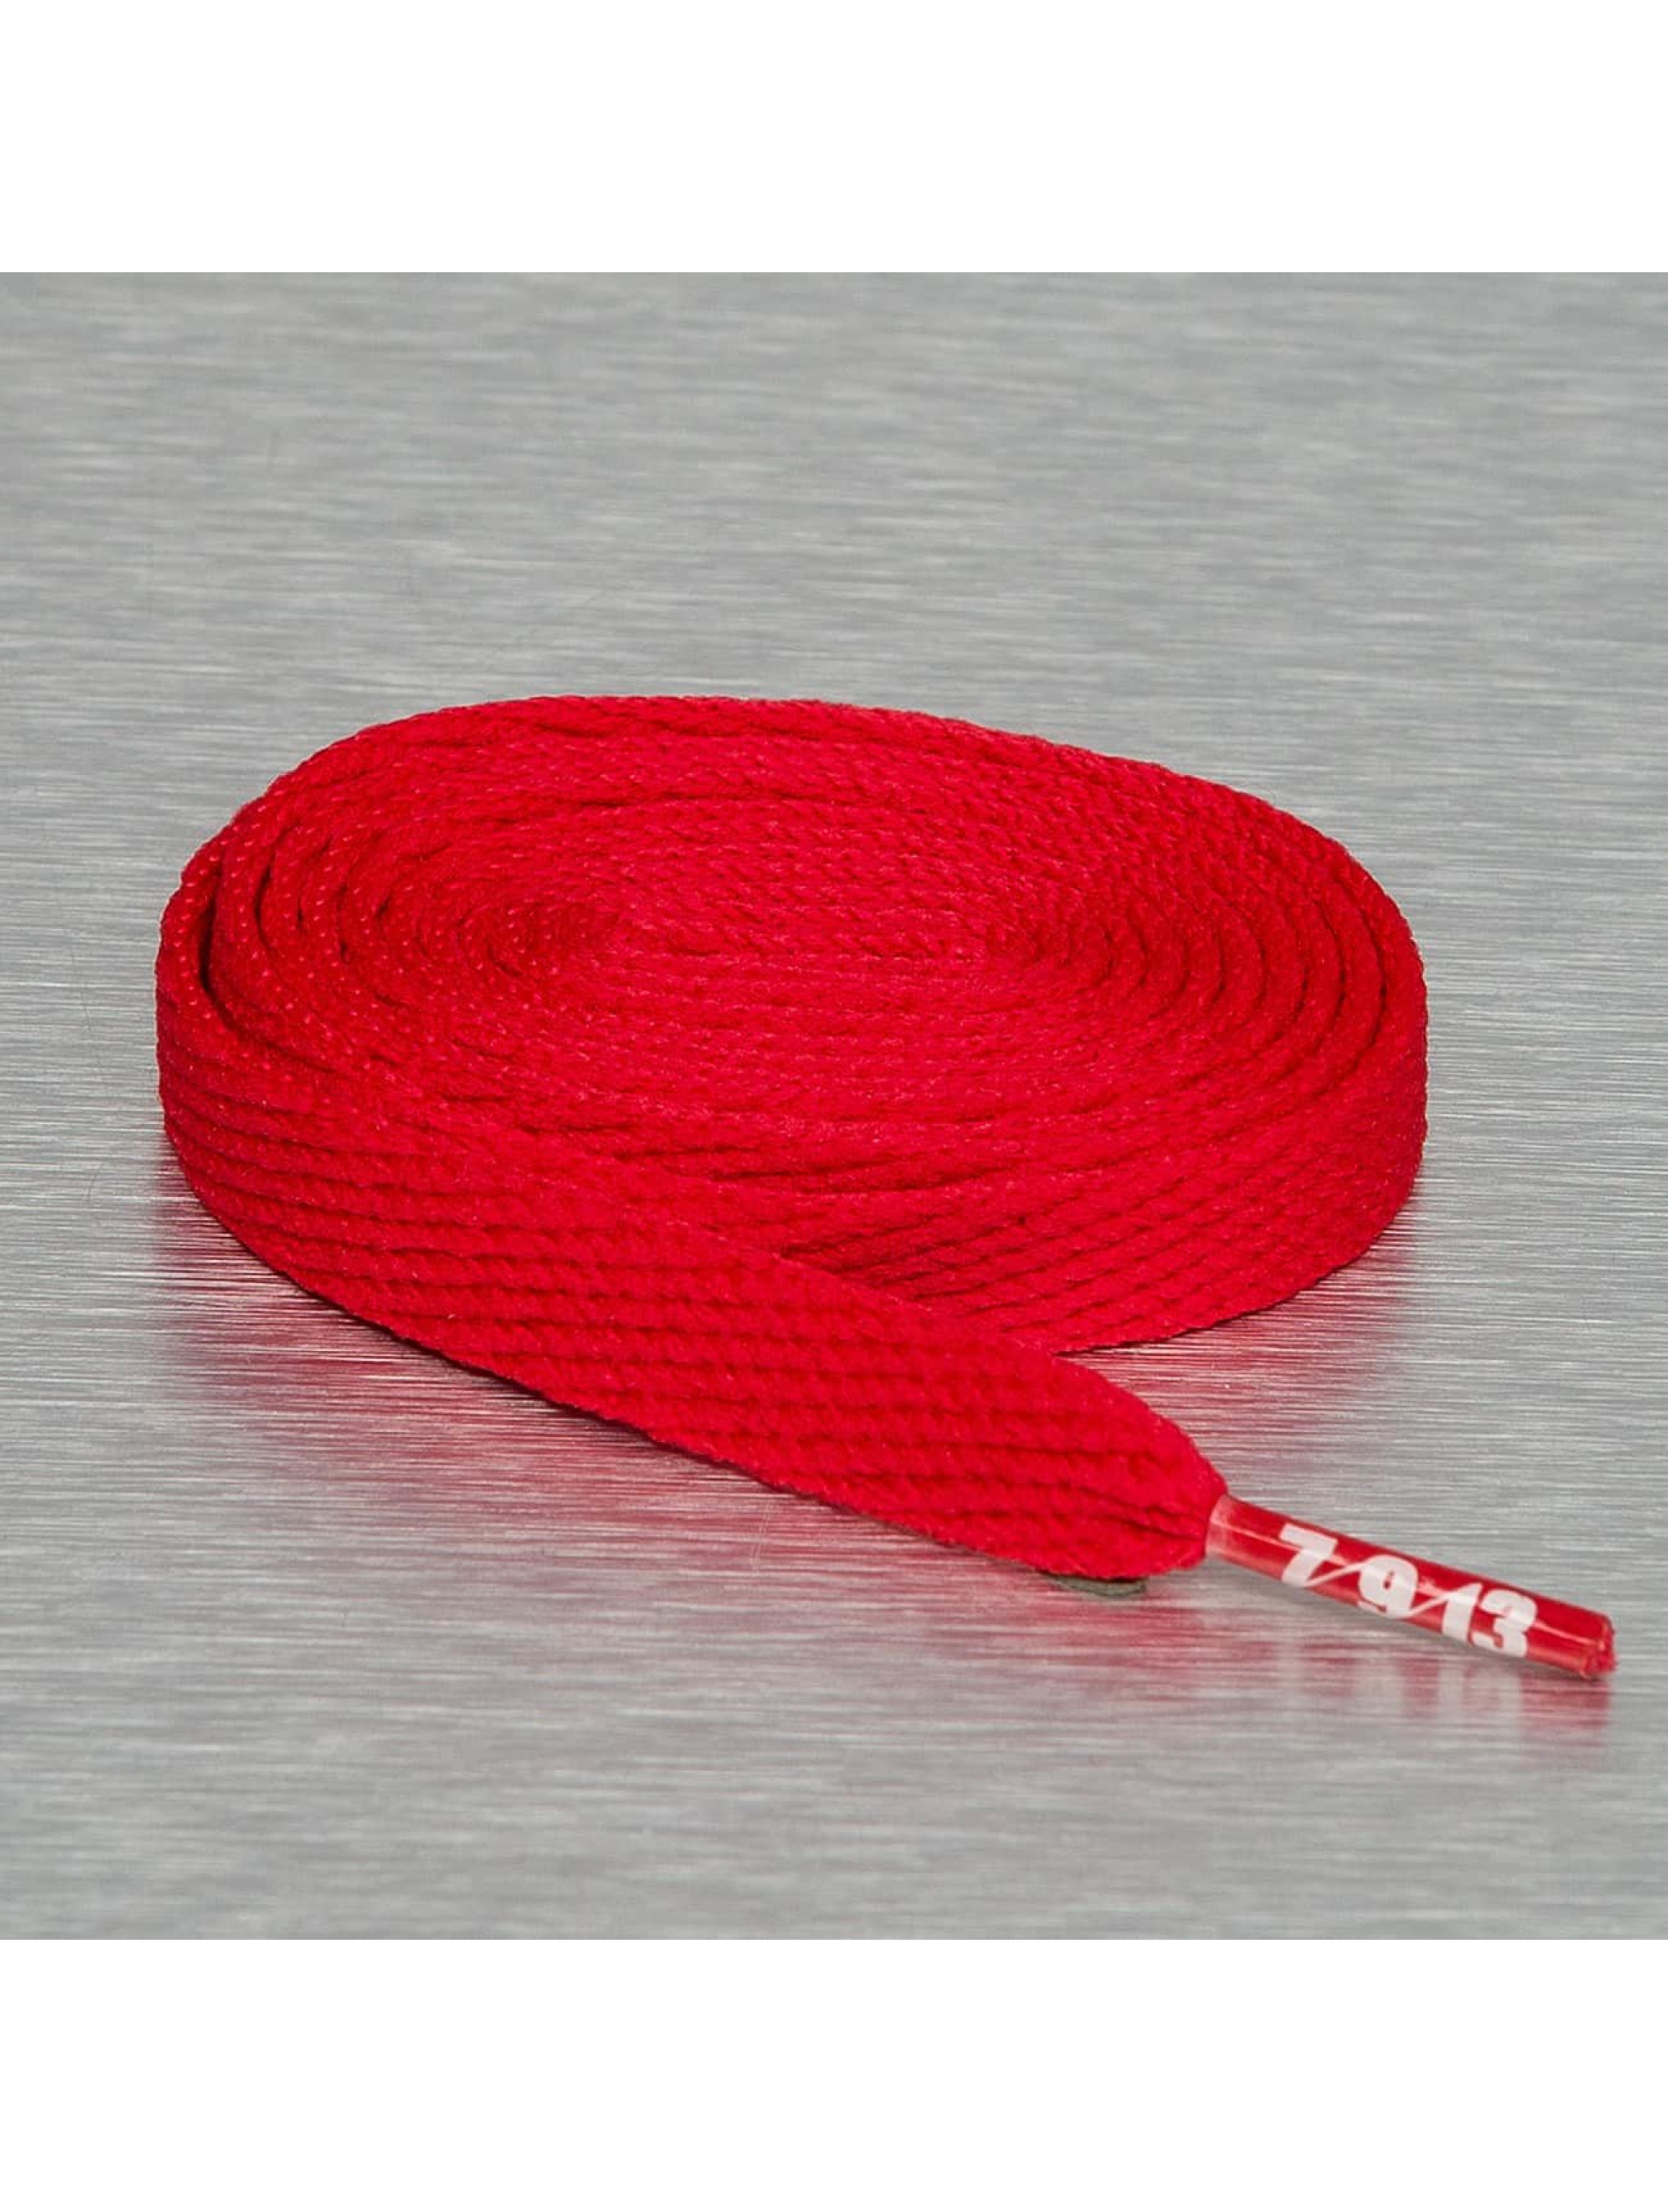 Seven Nine 13 Аксессуар для обуви Hard Candy Flat красный